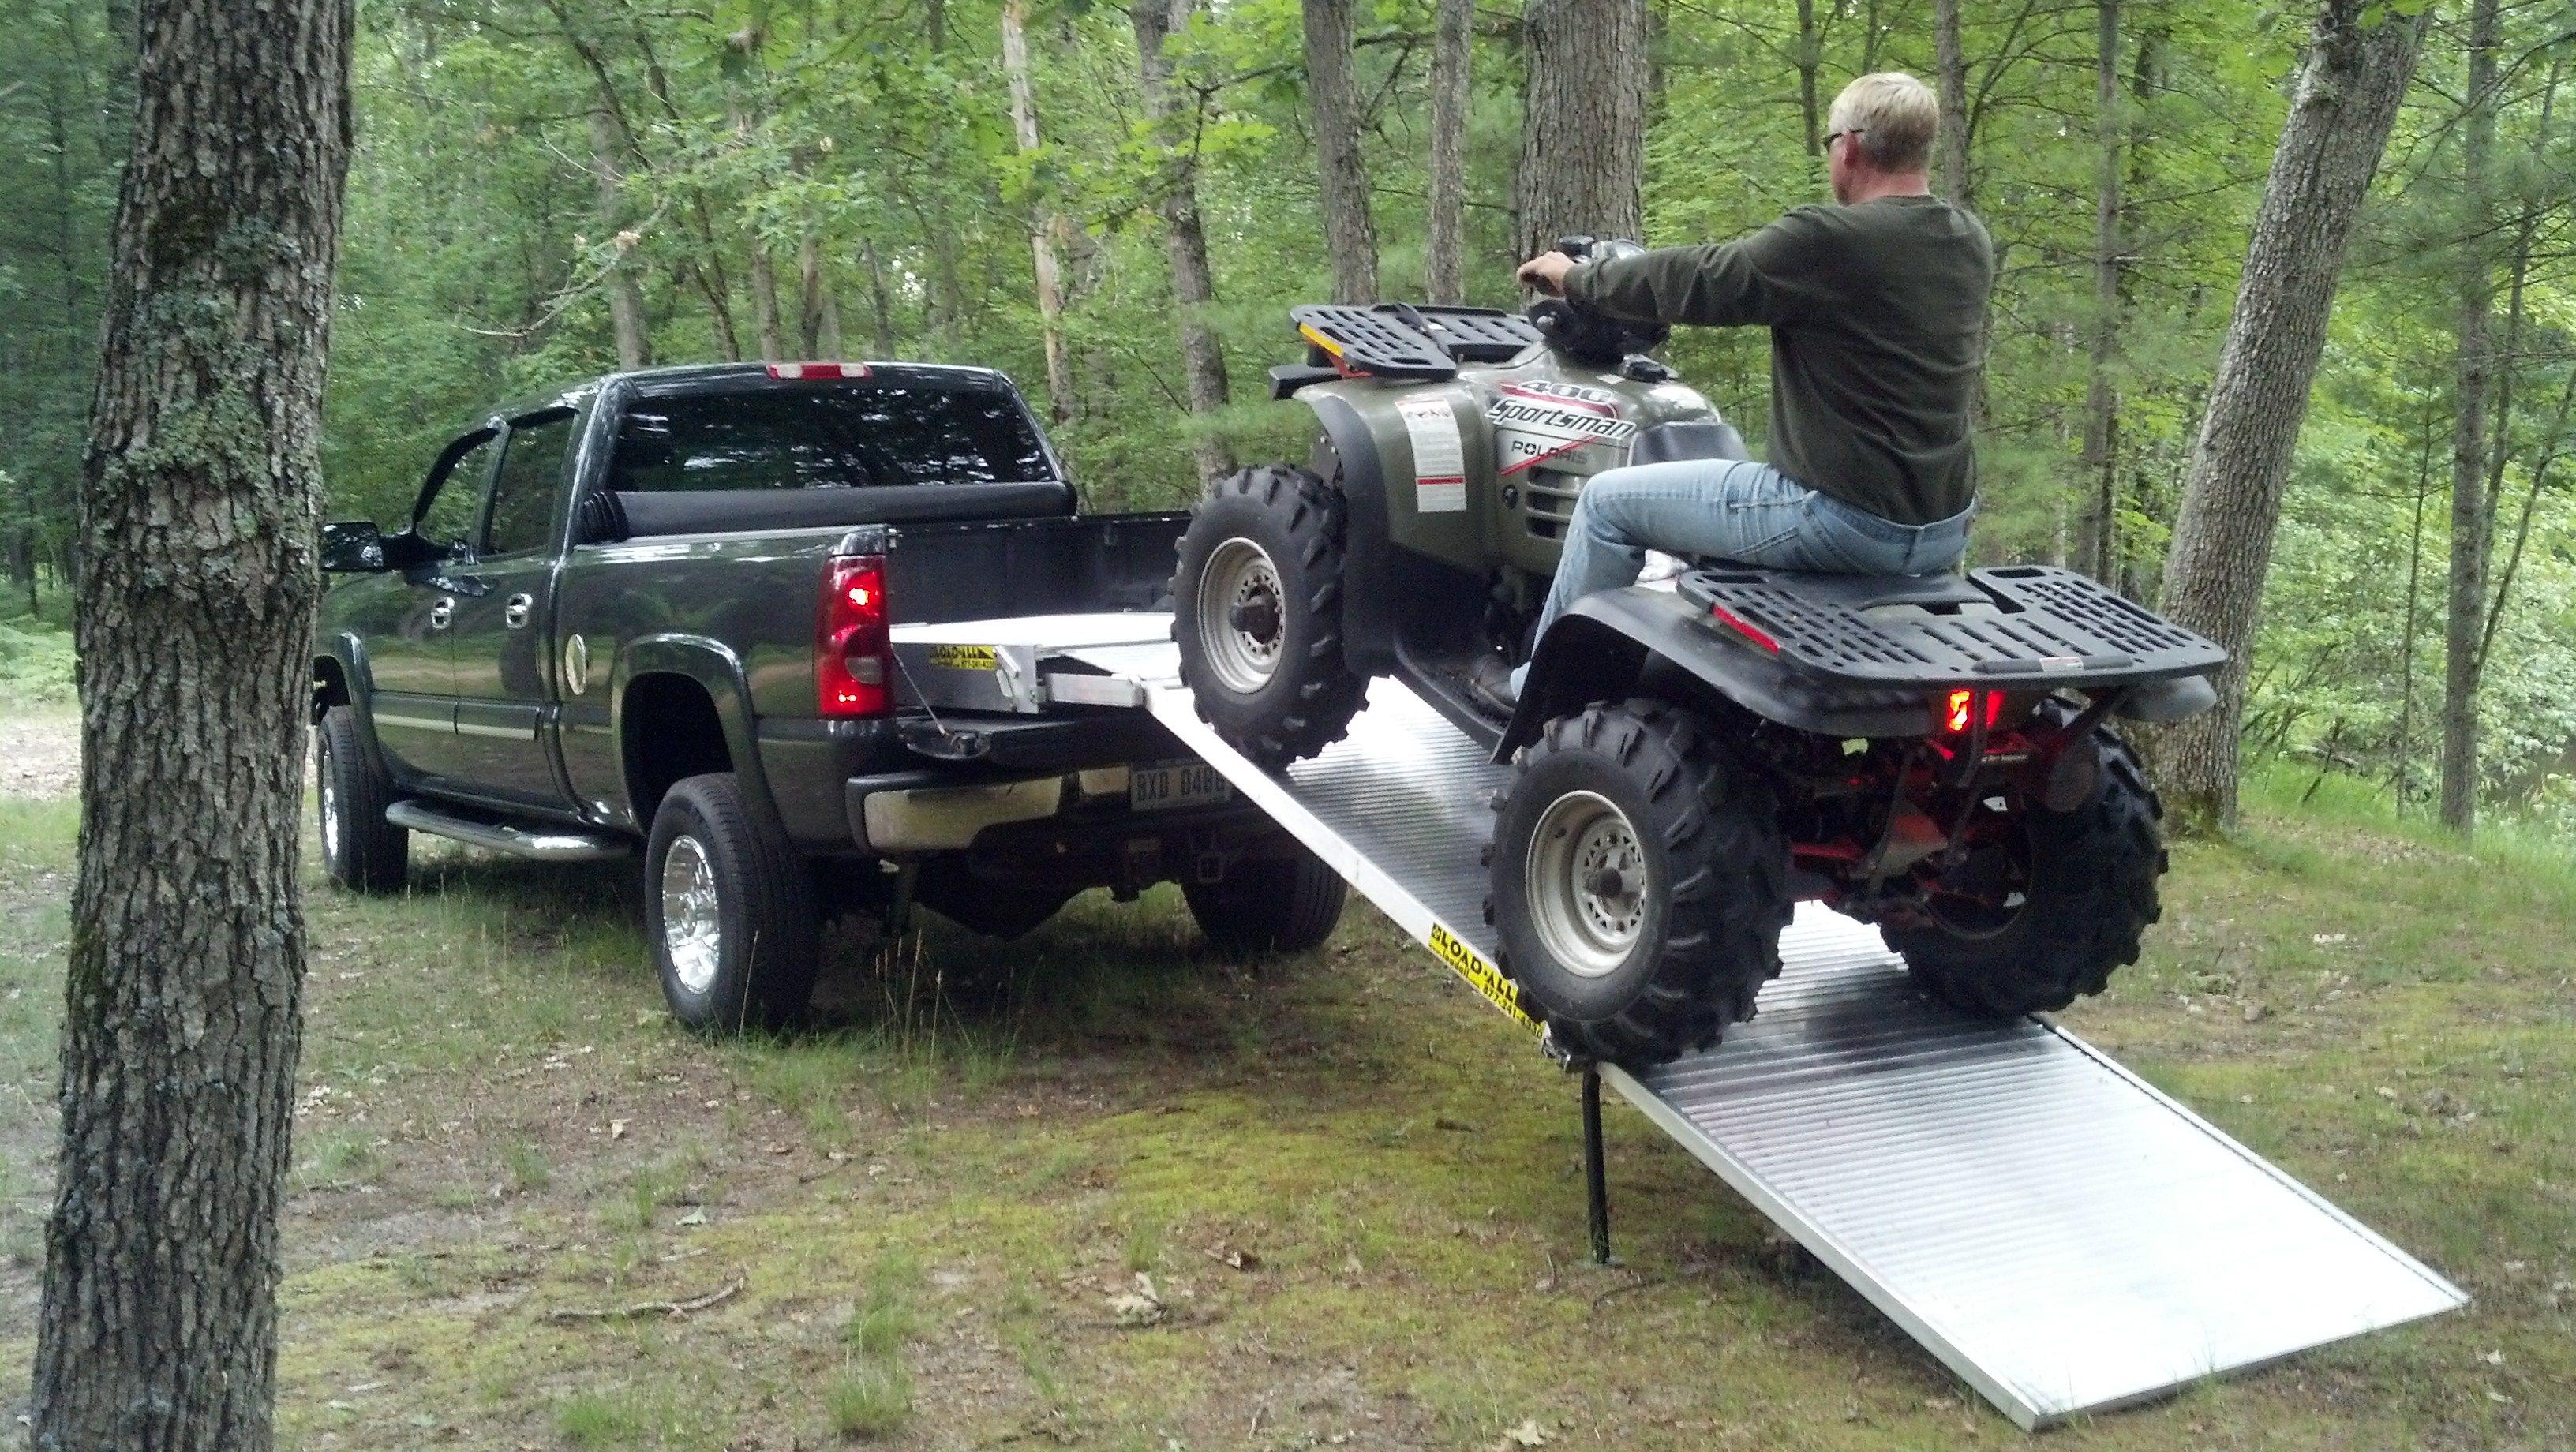 Loading a Polaris ATV made easy with a LoadAll V3